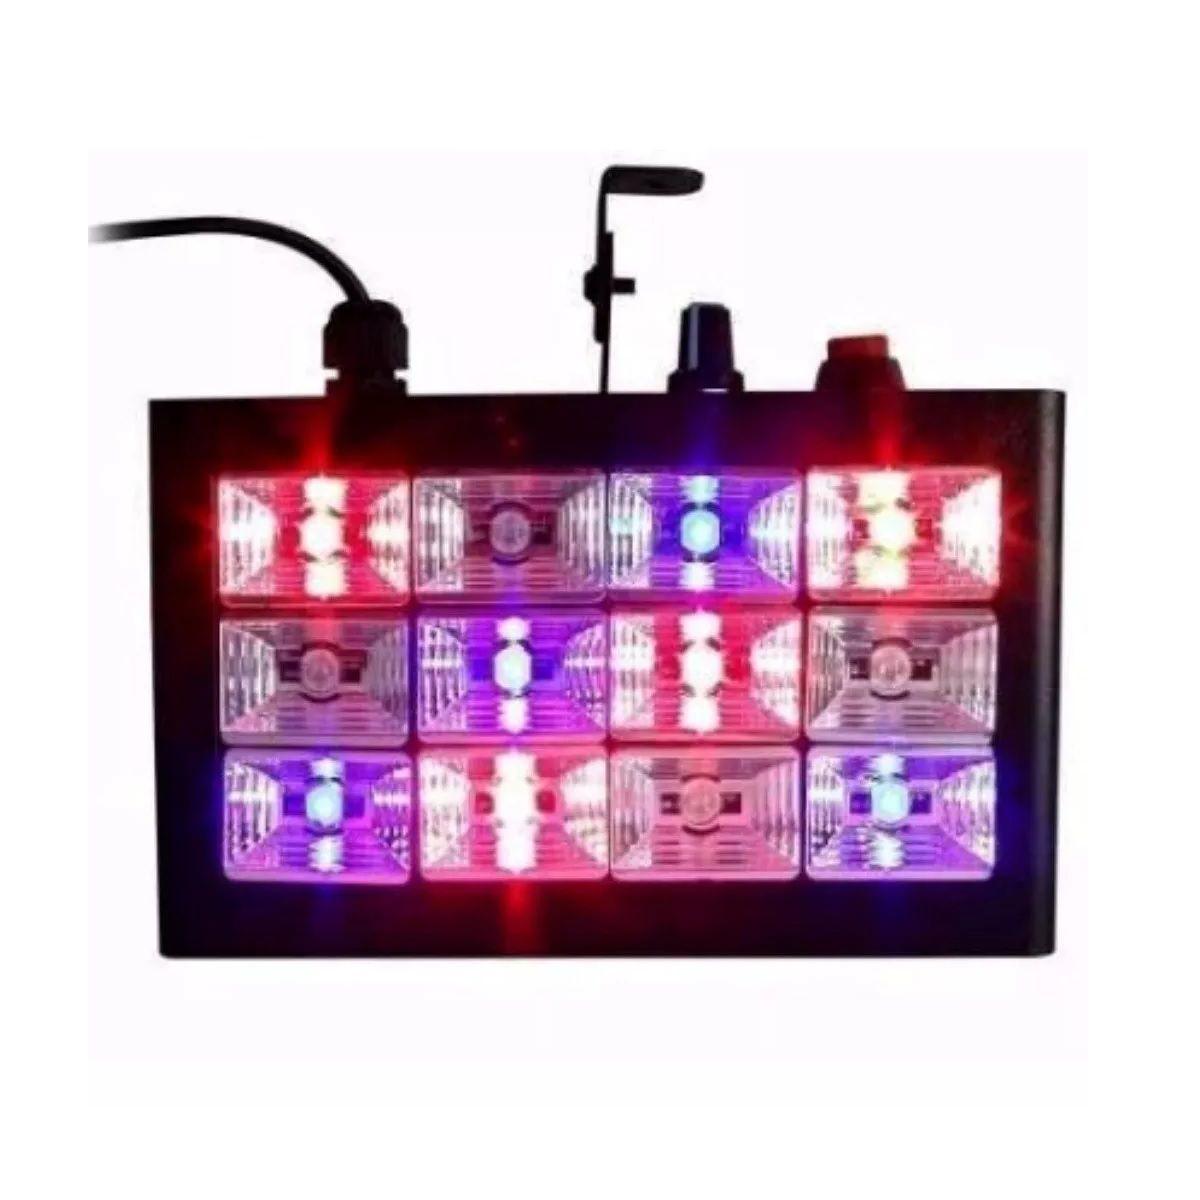 Kit 2x Strobo 12 Leds RGB 15W Rítmico Bivolt Automático